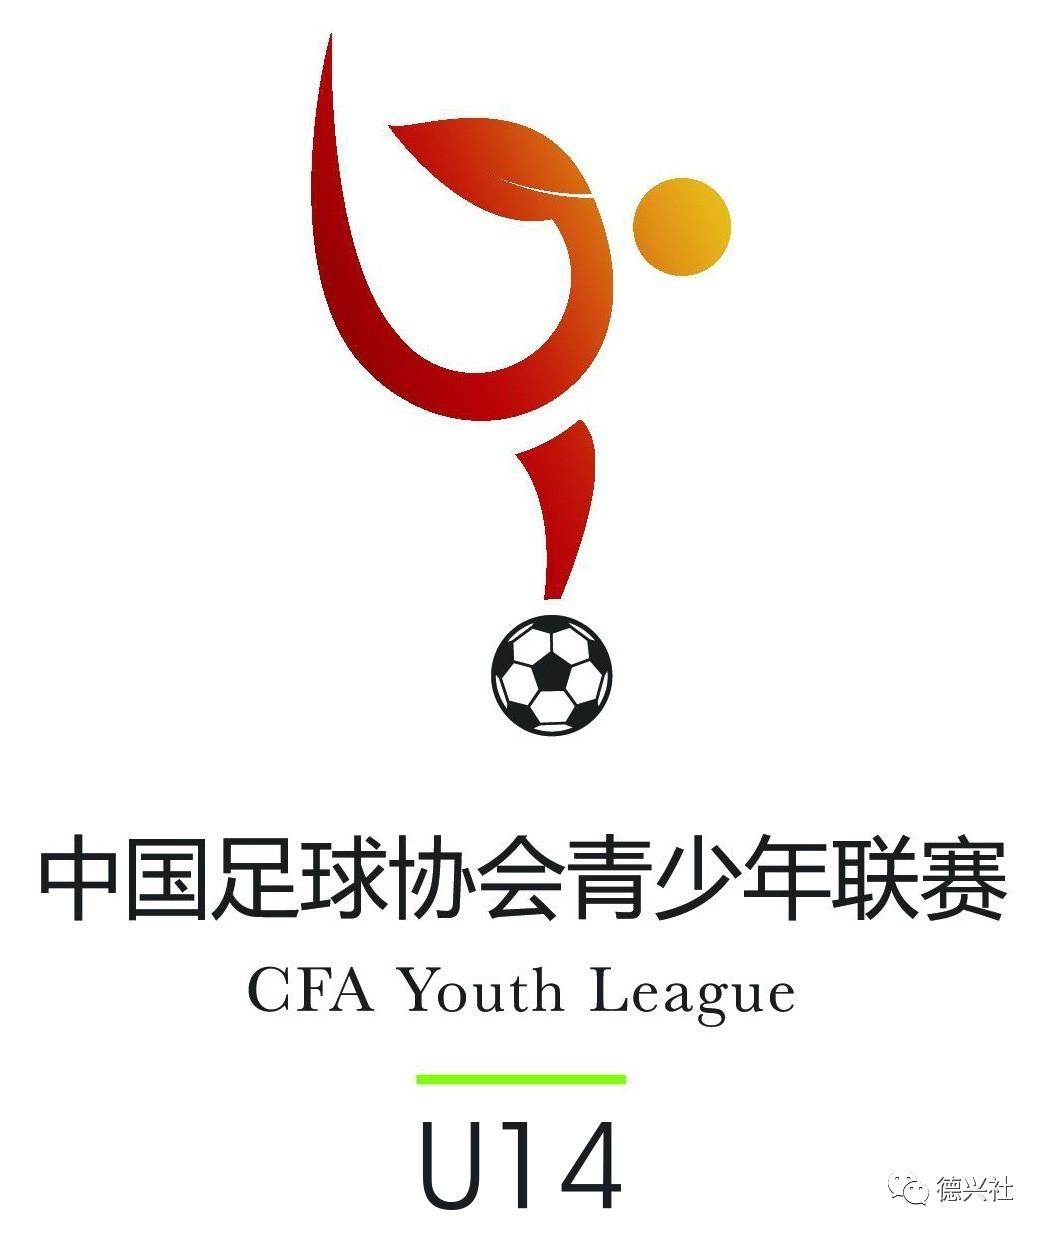 U14联赛第三阶段第四轮●亚泰三球横扫恒大 重庆辅仁继续连胜